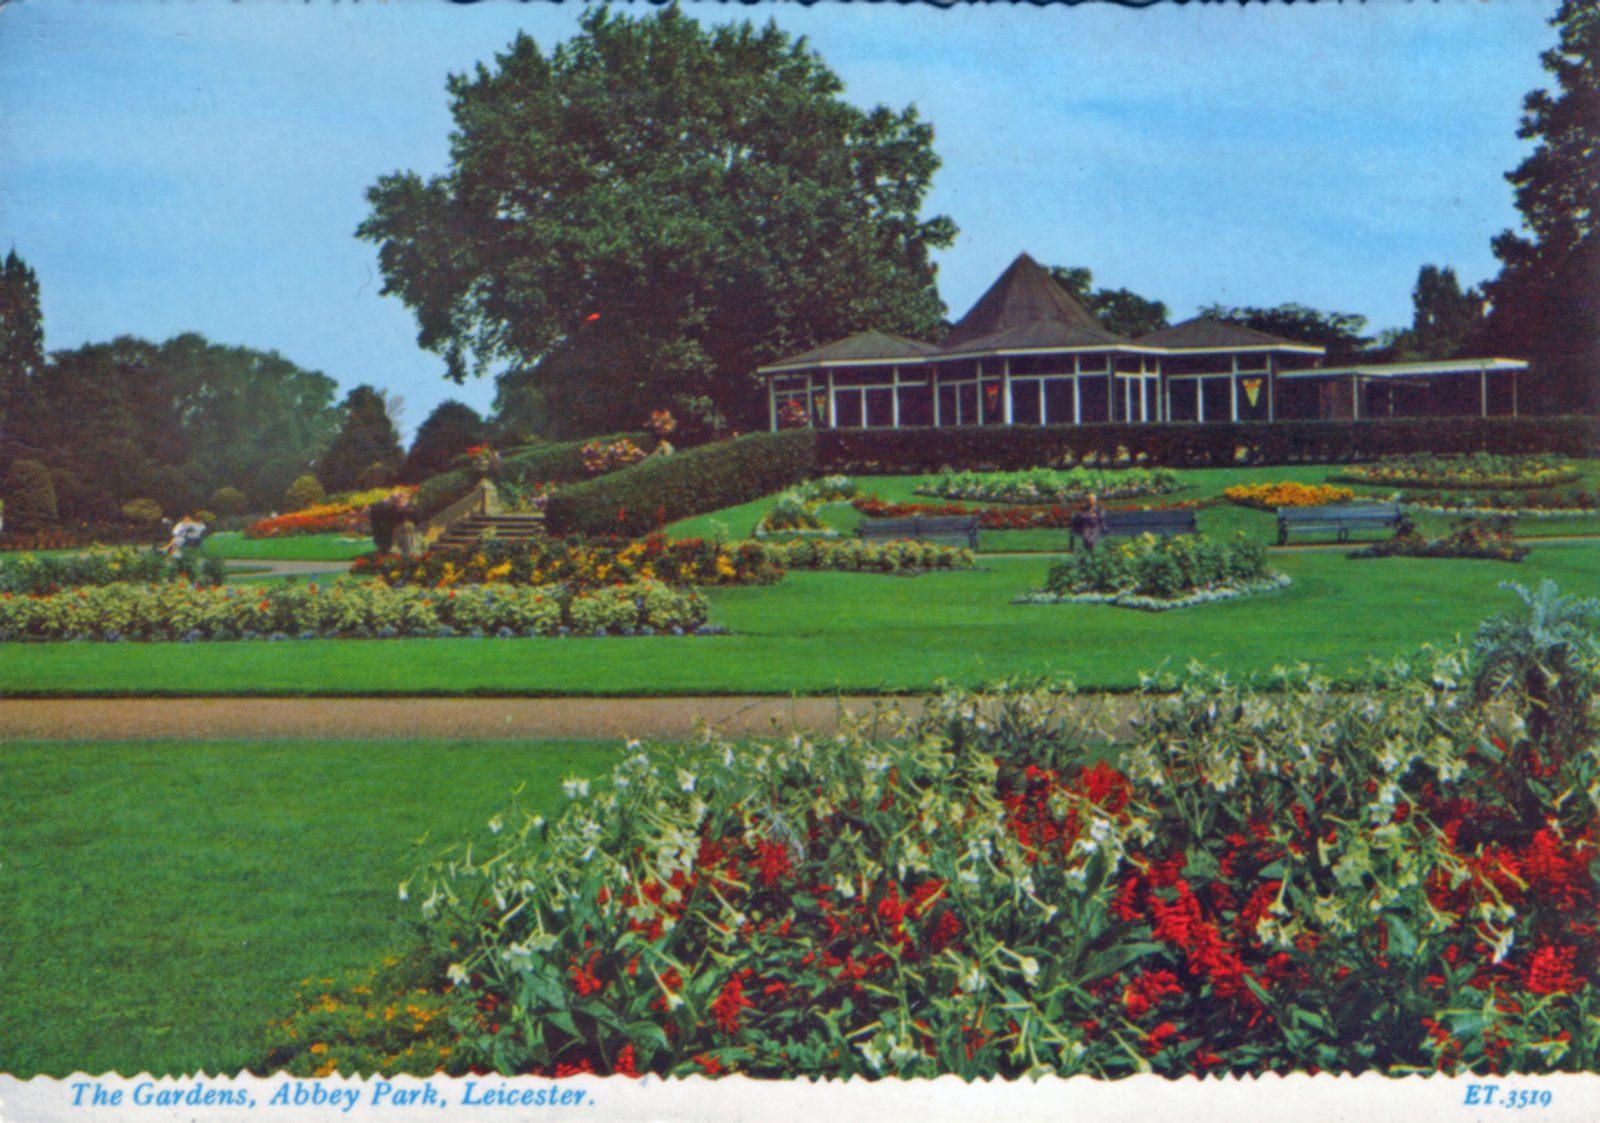 Abbey Park, Leicester. 1941-1960: Formal gardens and café. (File:1219)